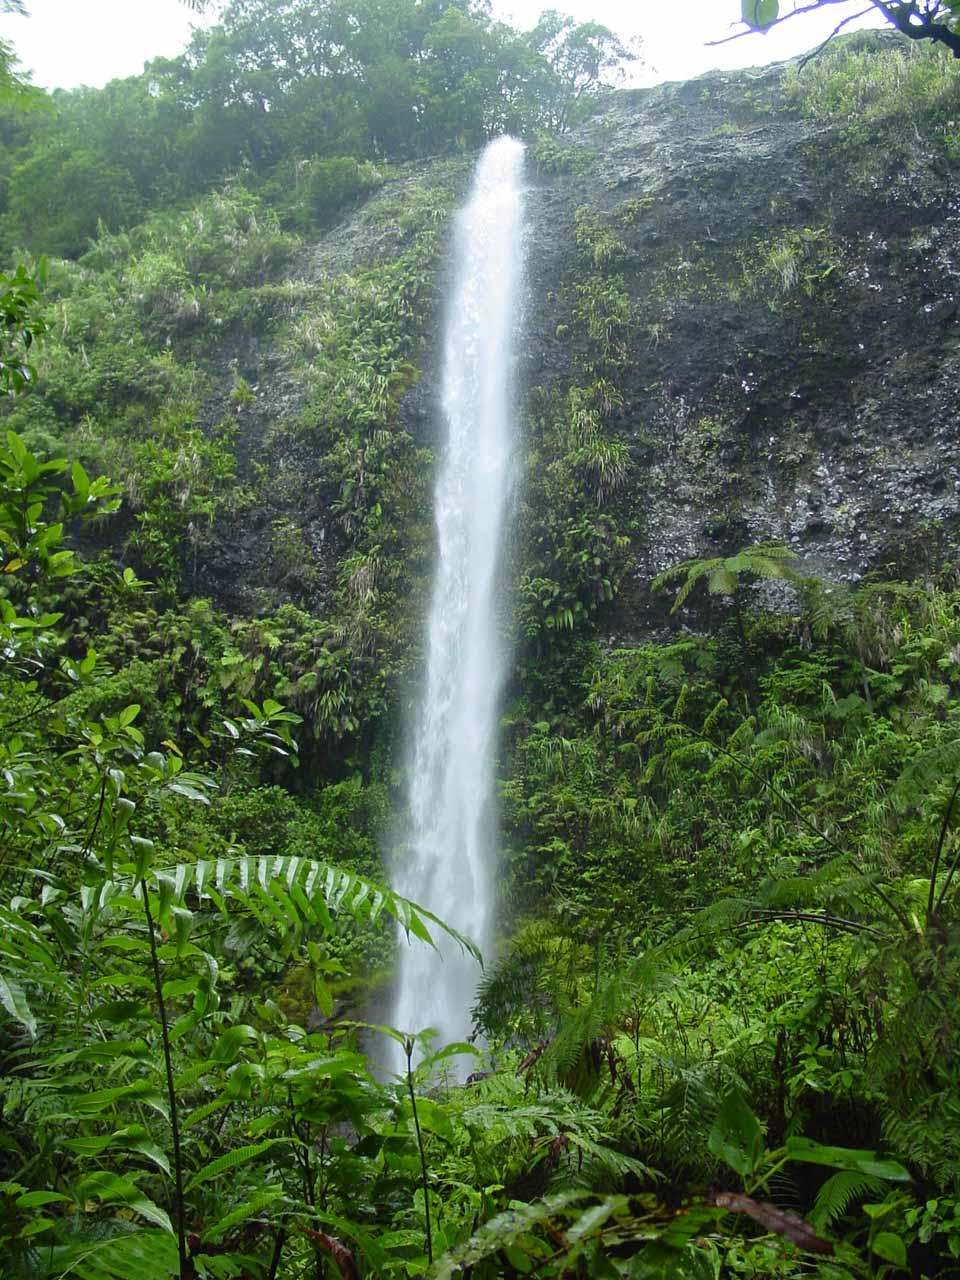 Savu-i-One Waterfall in Koroyanitu National Park near the remote Abaca